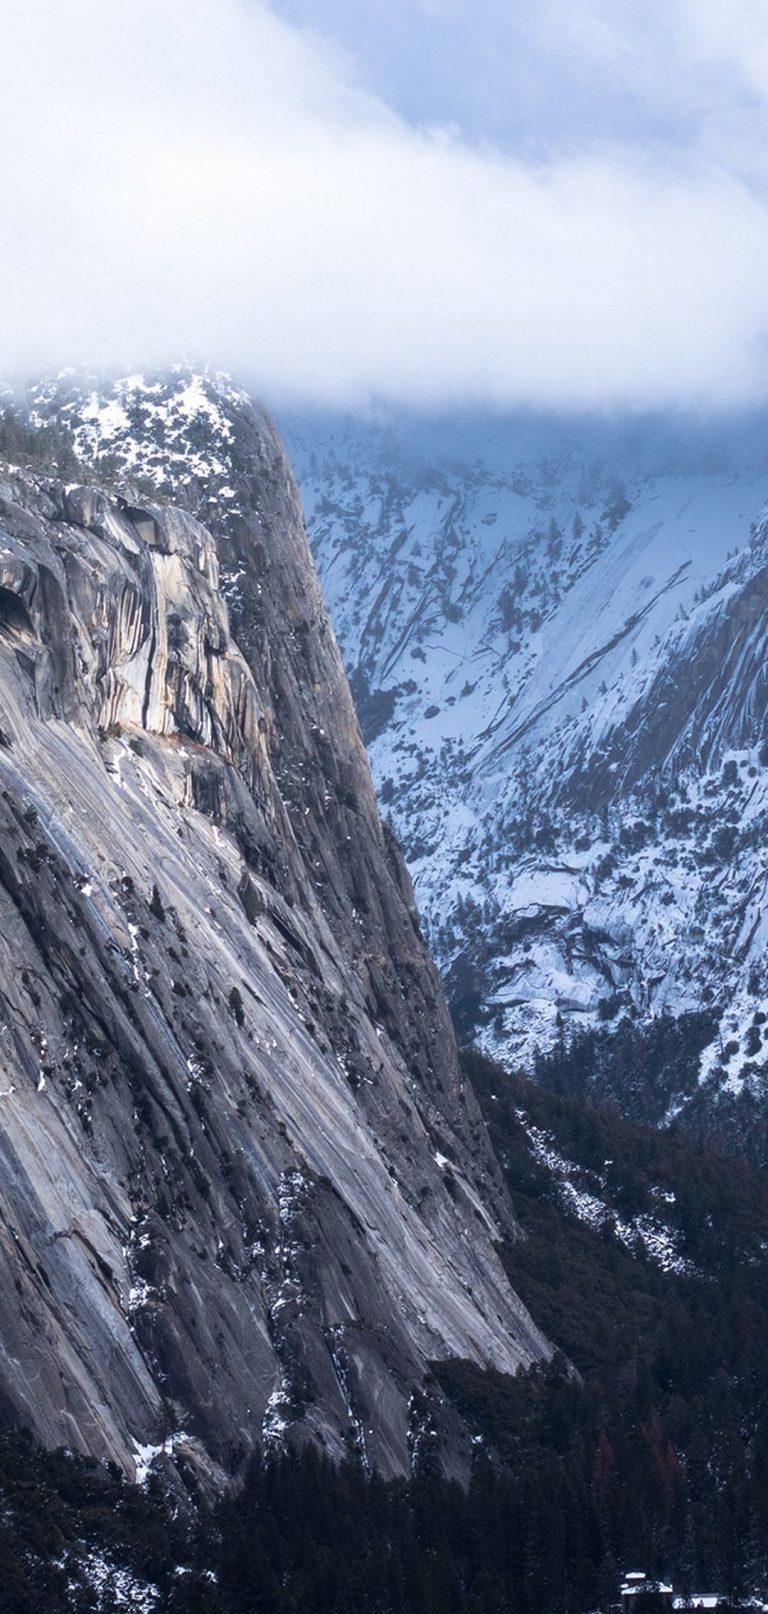 Rocks Mountains Top Snow 1080x2270 768x1614